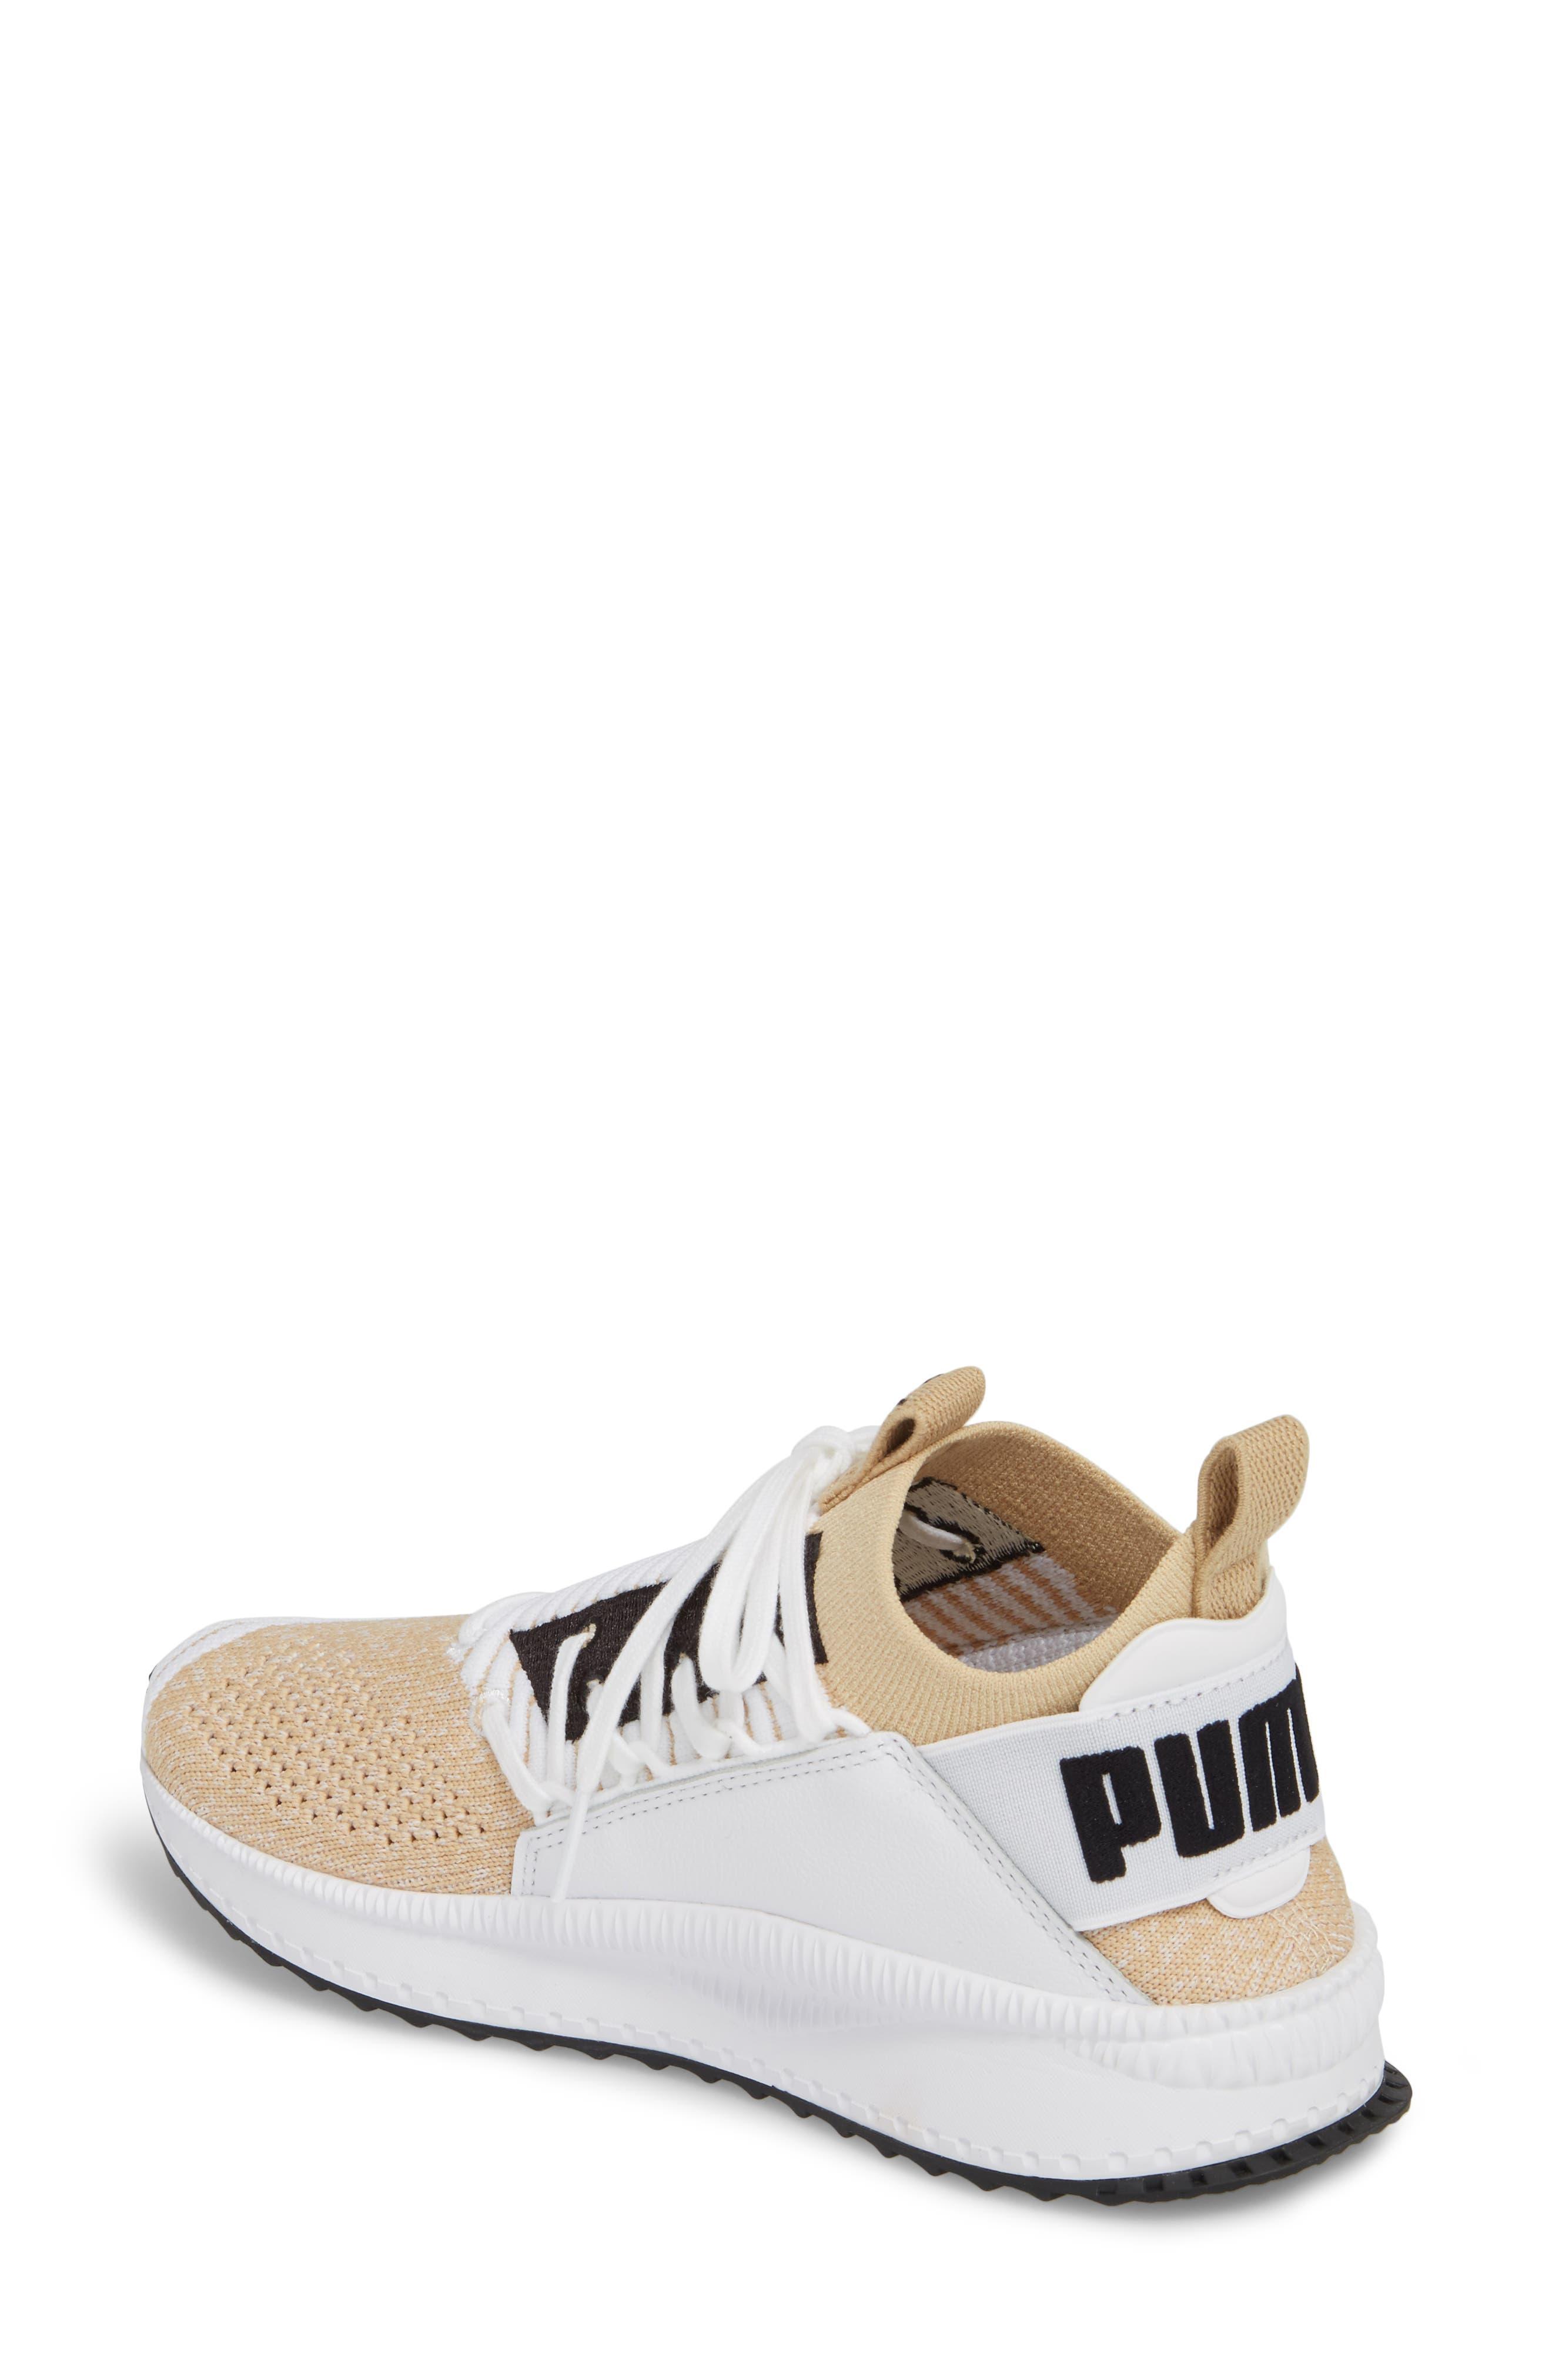 Tsugi Jun Knit Sneaker,                             Alternate thumbnail 11, color,